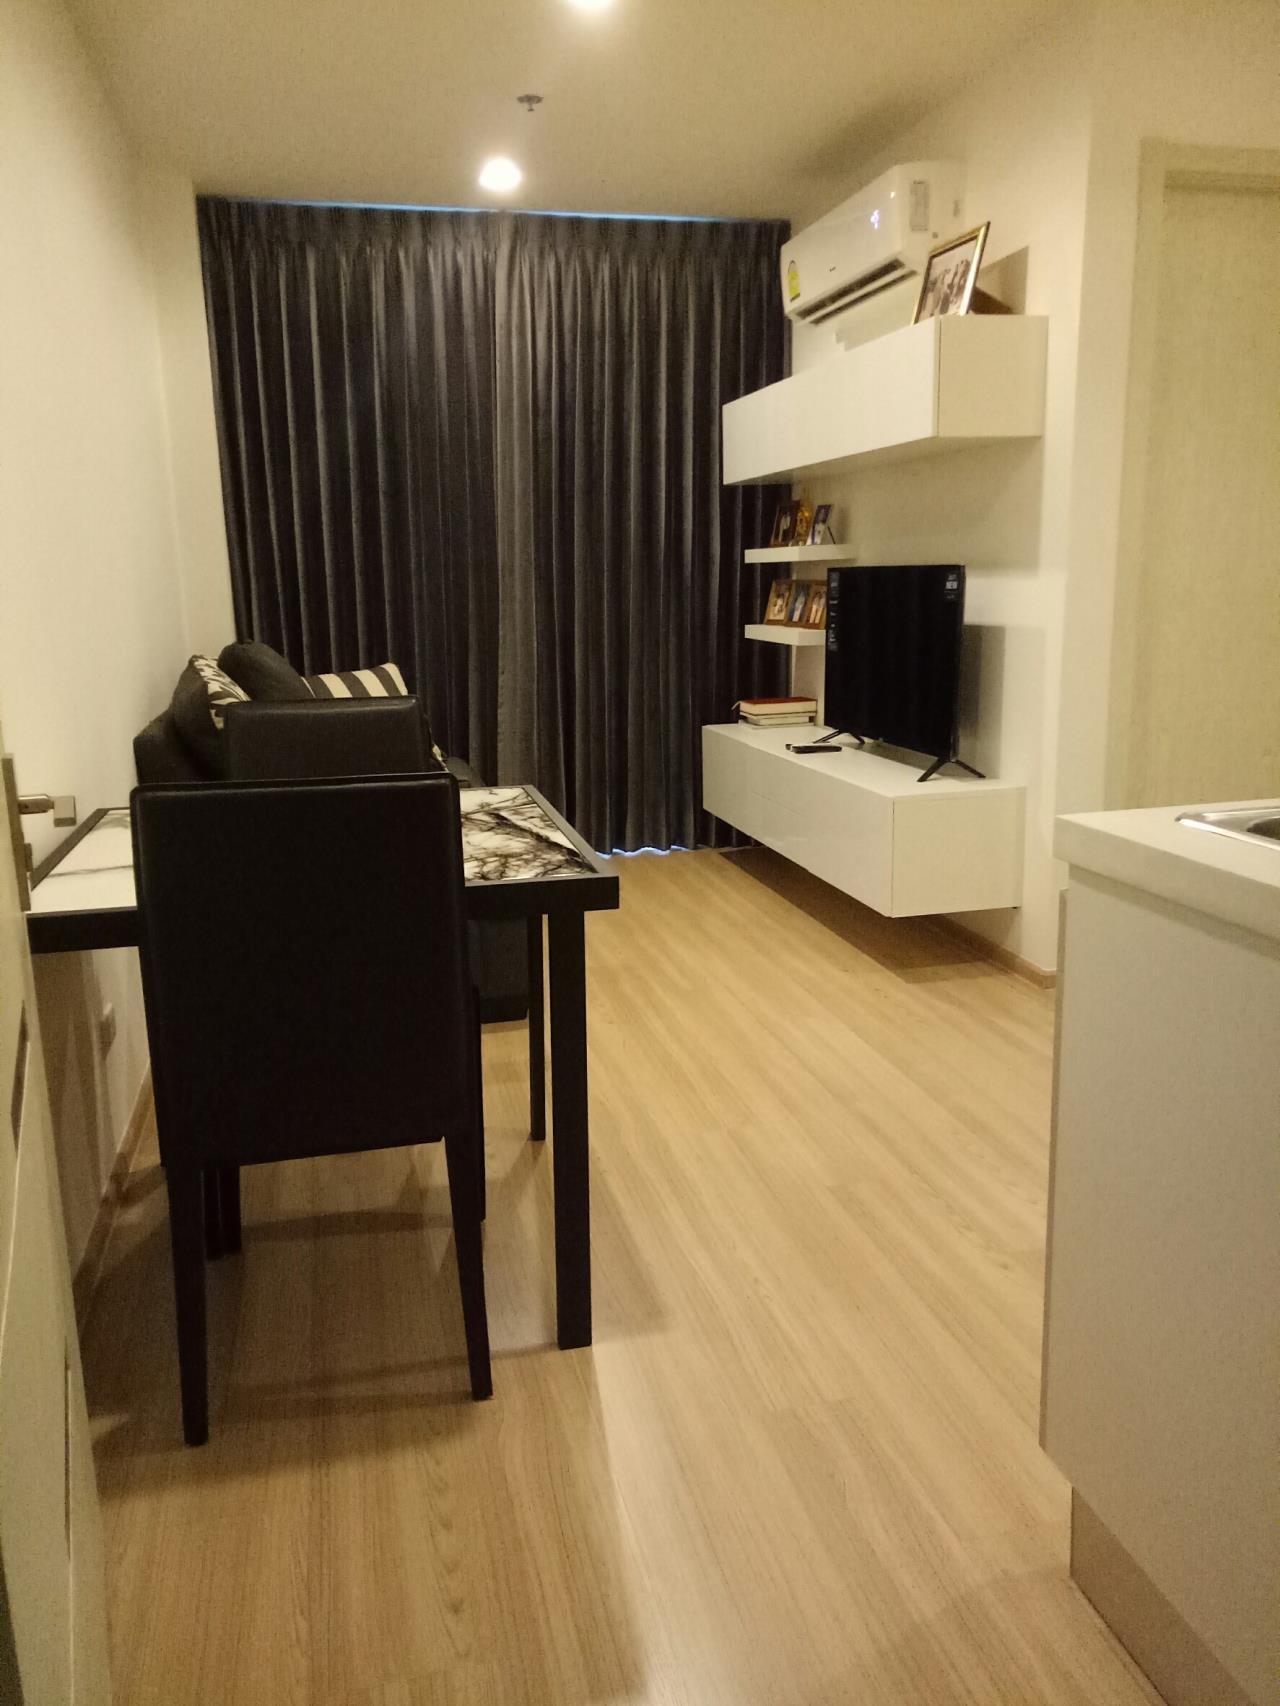 Quality Life Property Agency's Artemis Sukhumvit 77 (RENT / SELL) 3